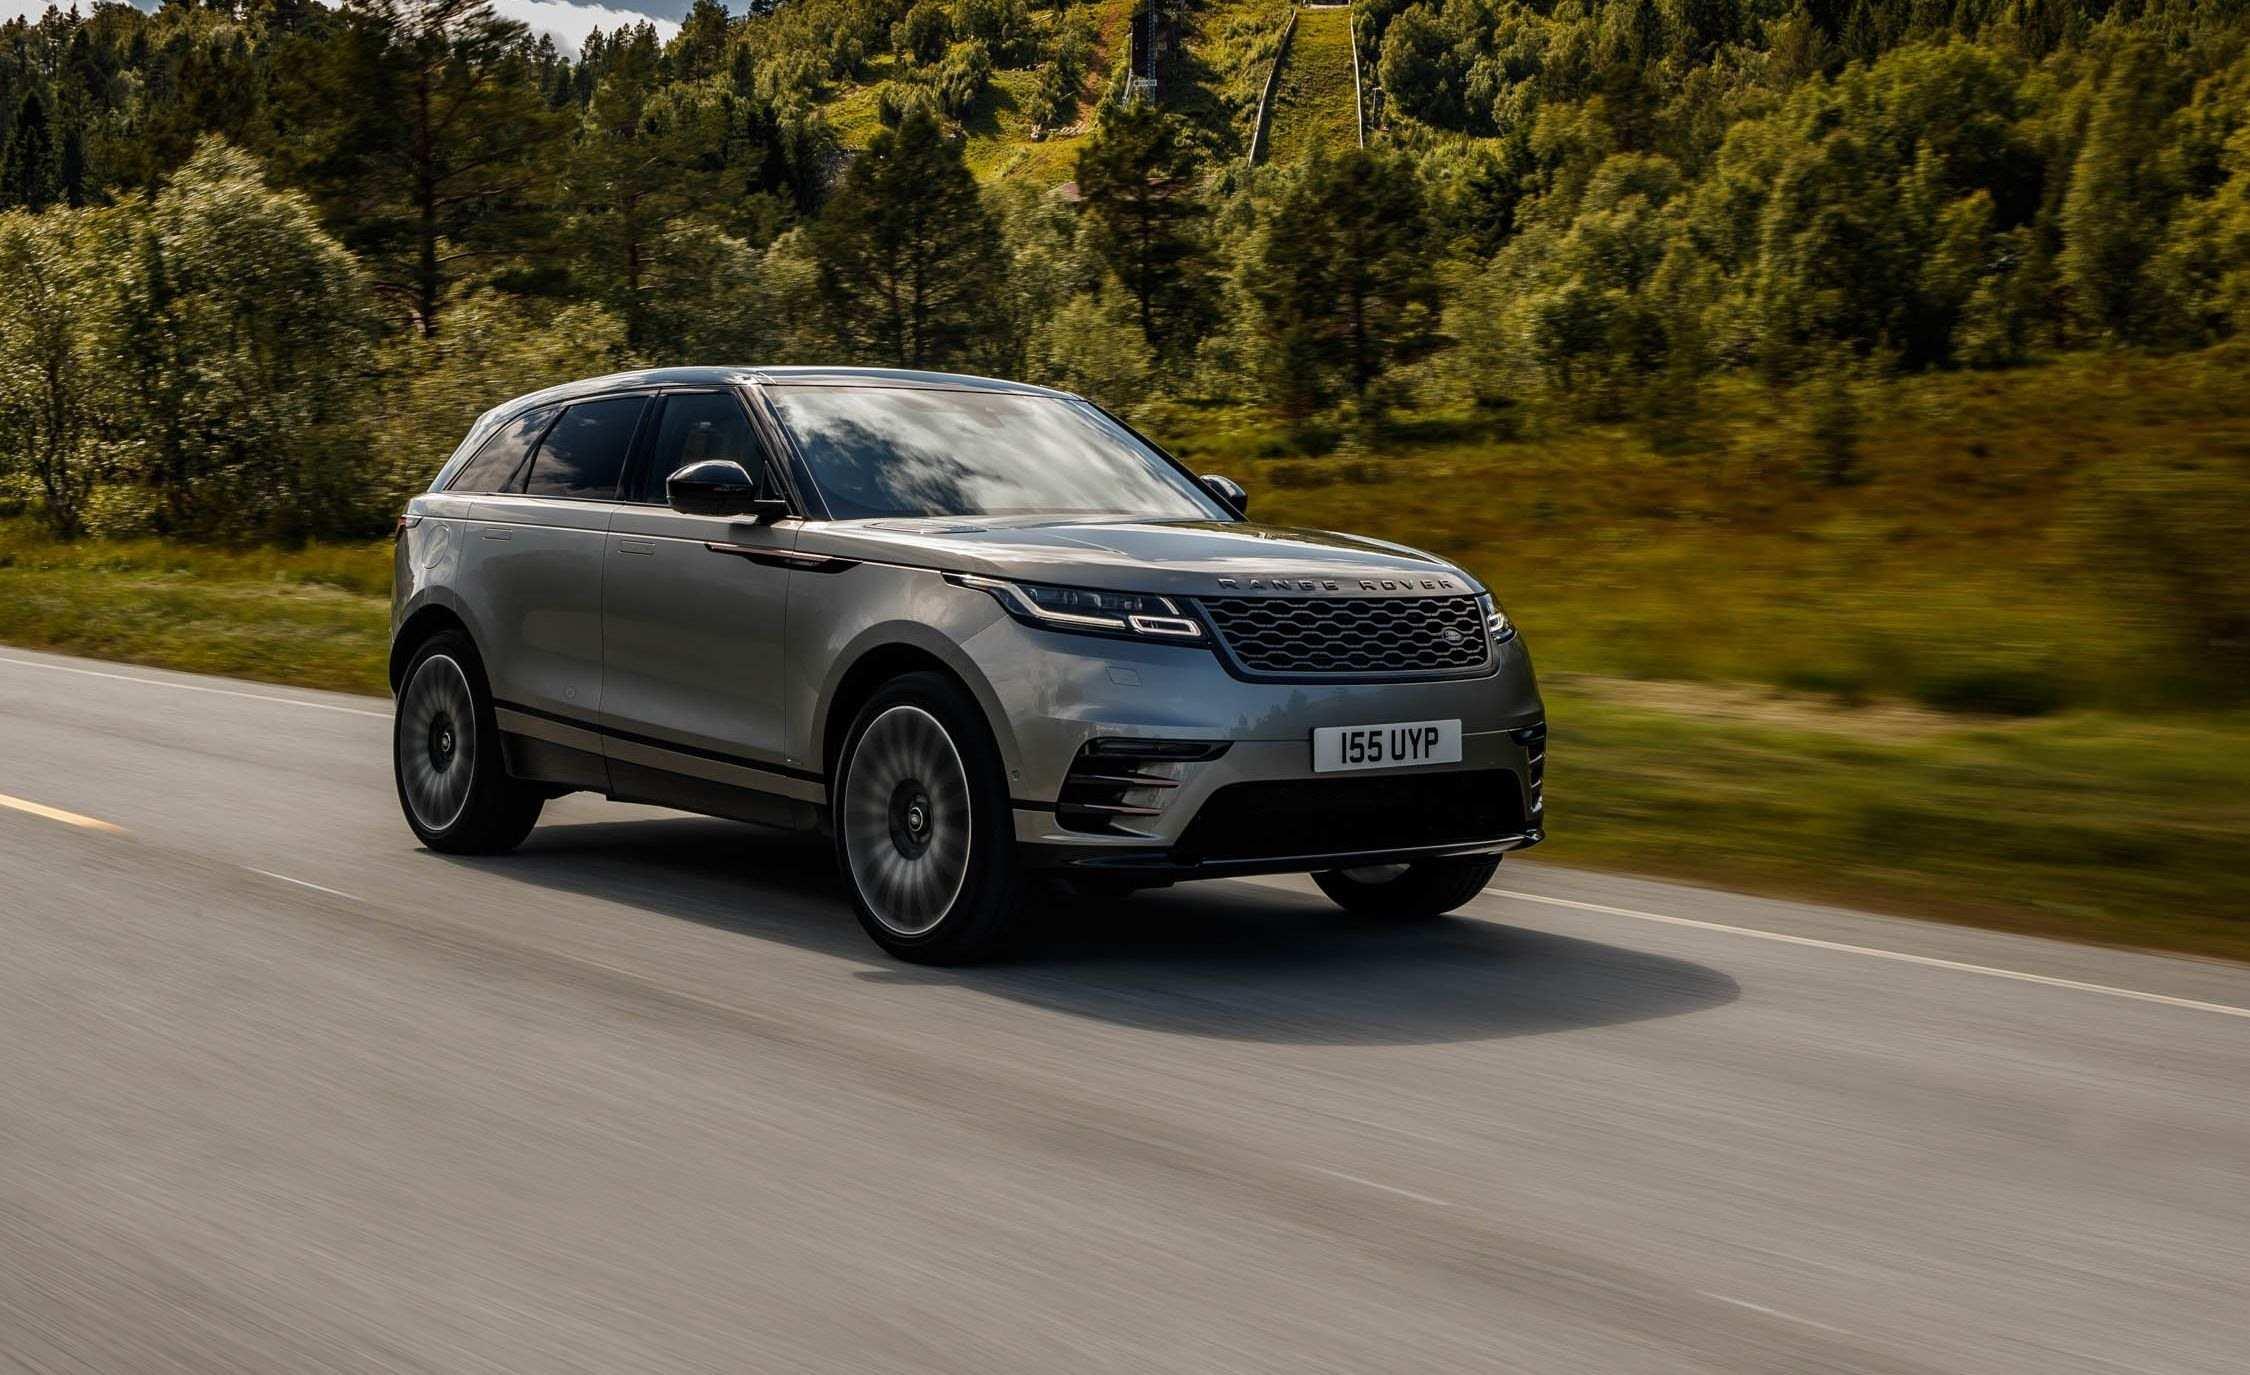 91 New 2020 Range Rover Evoque Xl Style for 2020 Range Rover Evoque Xl